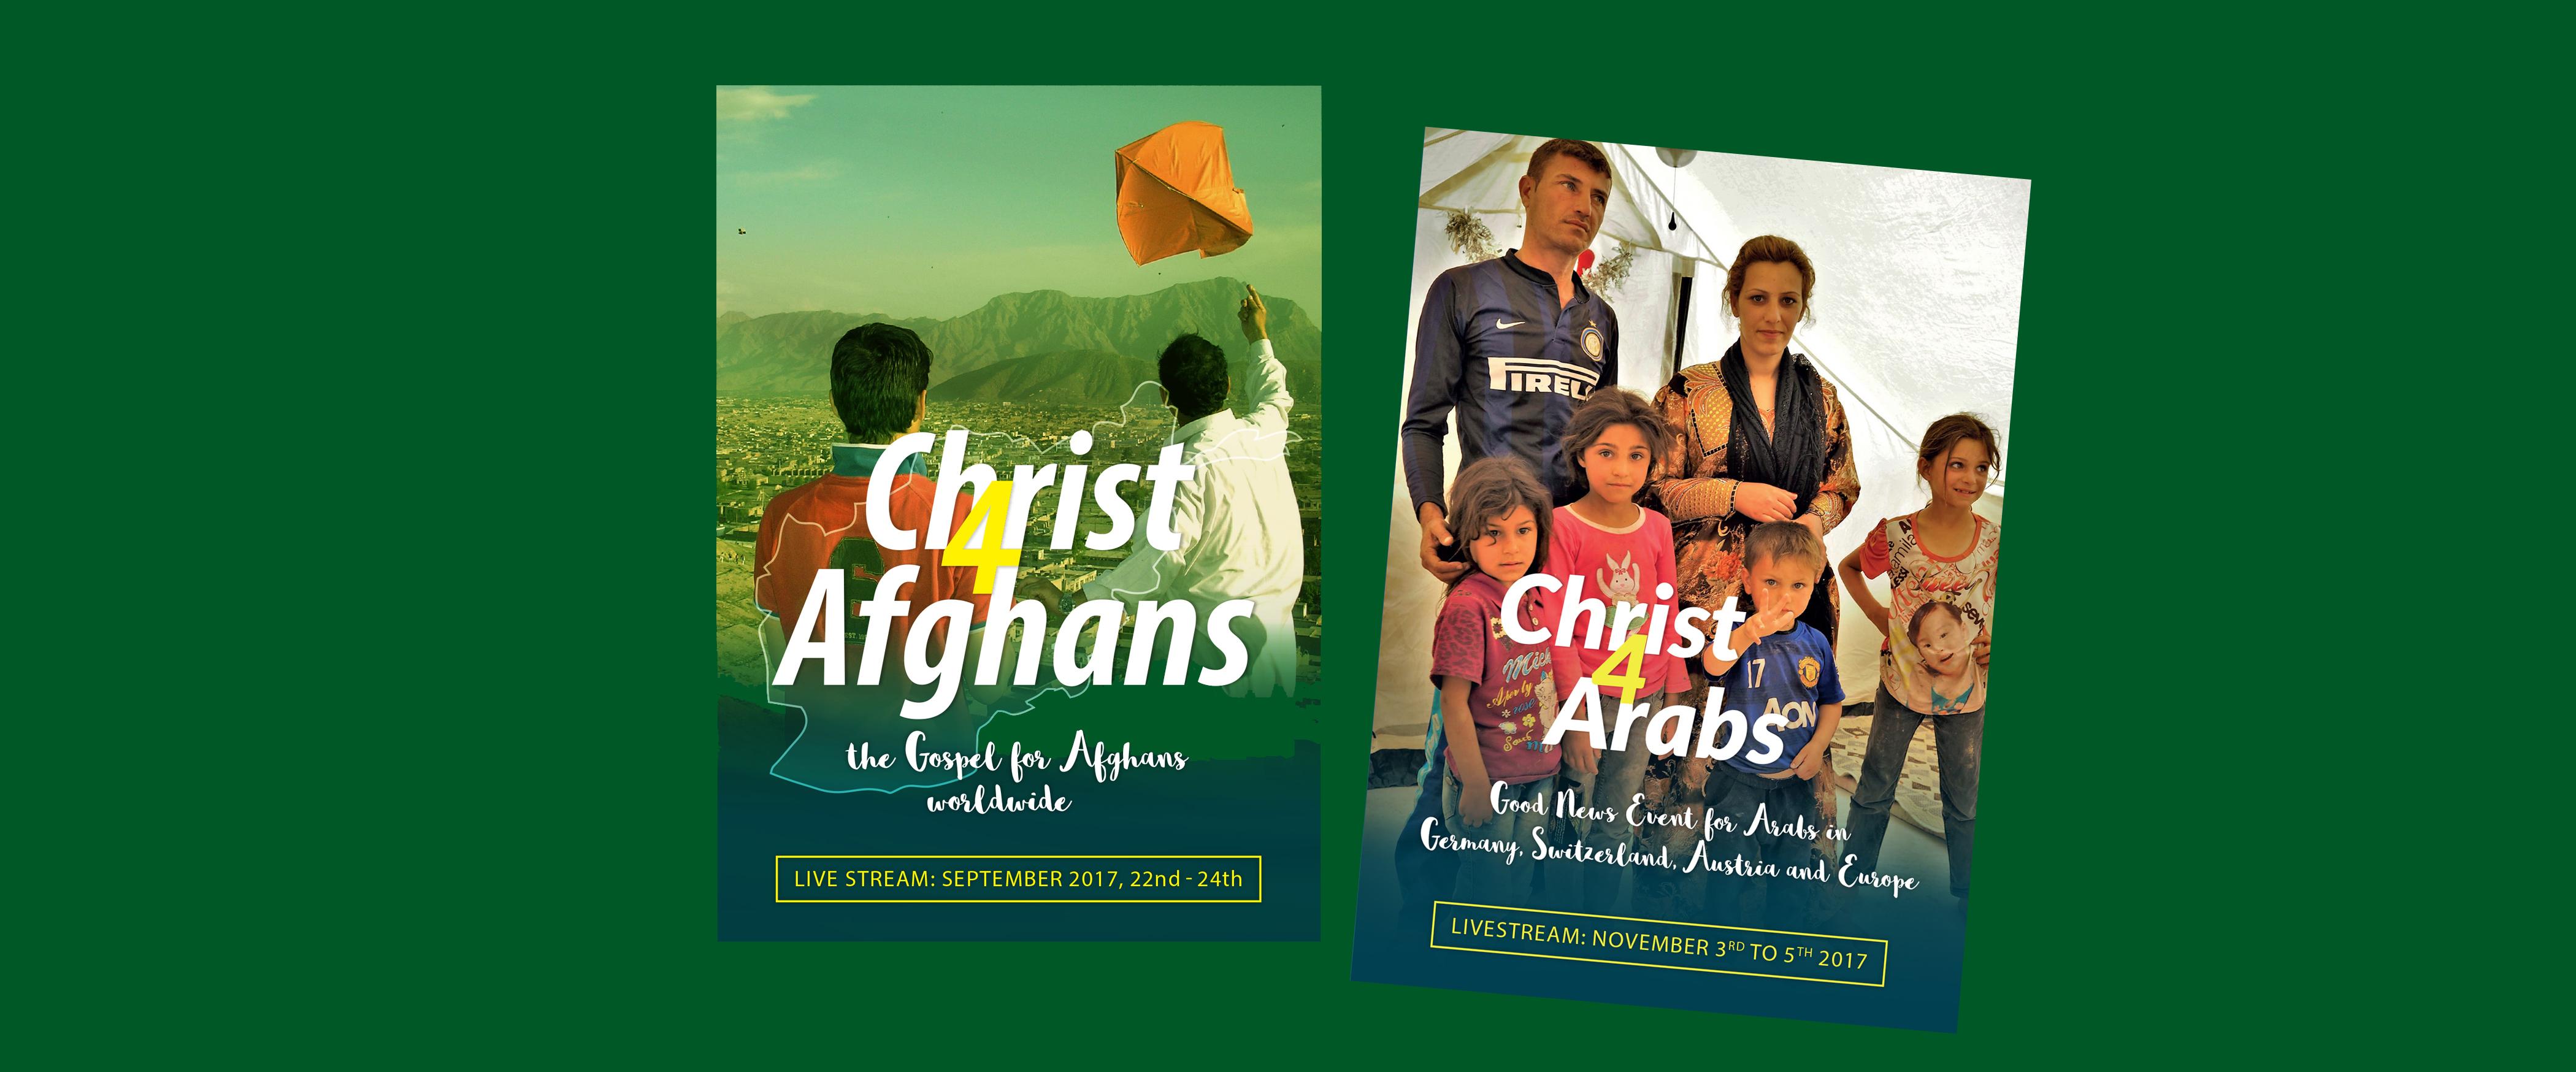 Christ4Afghans and Christ4Arab Livestream